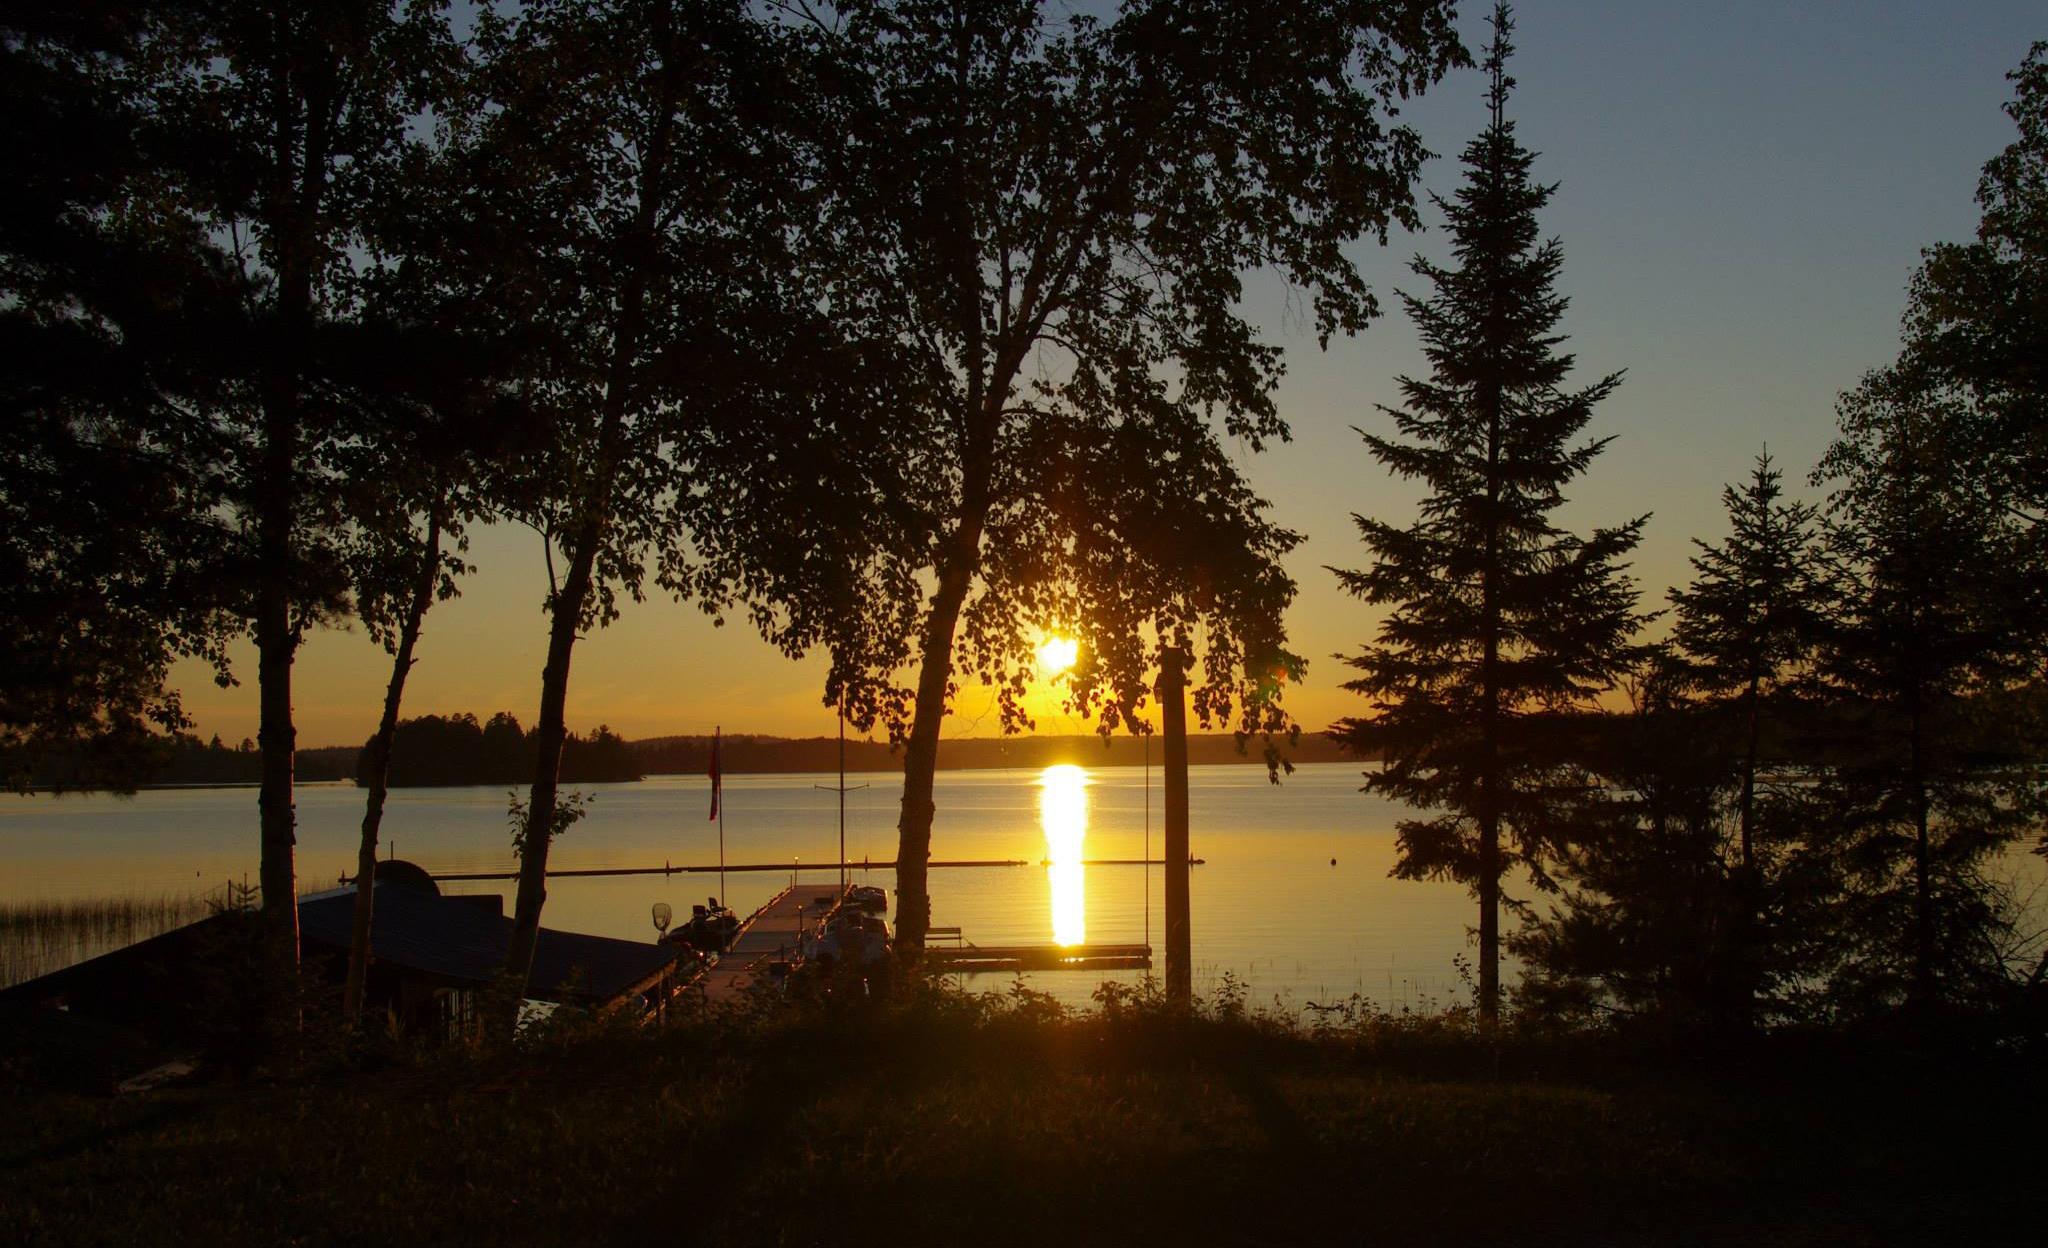 Sleepy Dog Cabins Sunset Country Ontario Canada